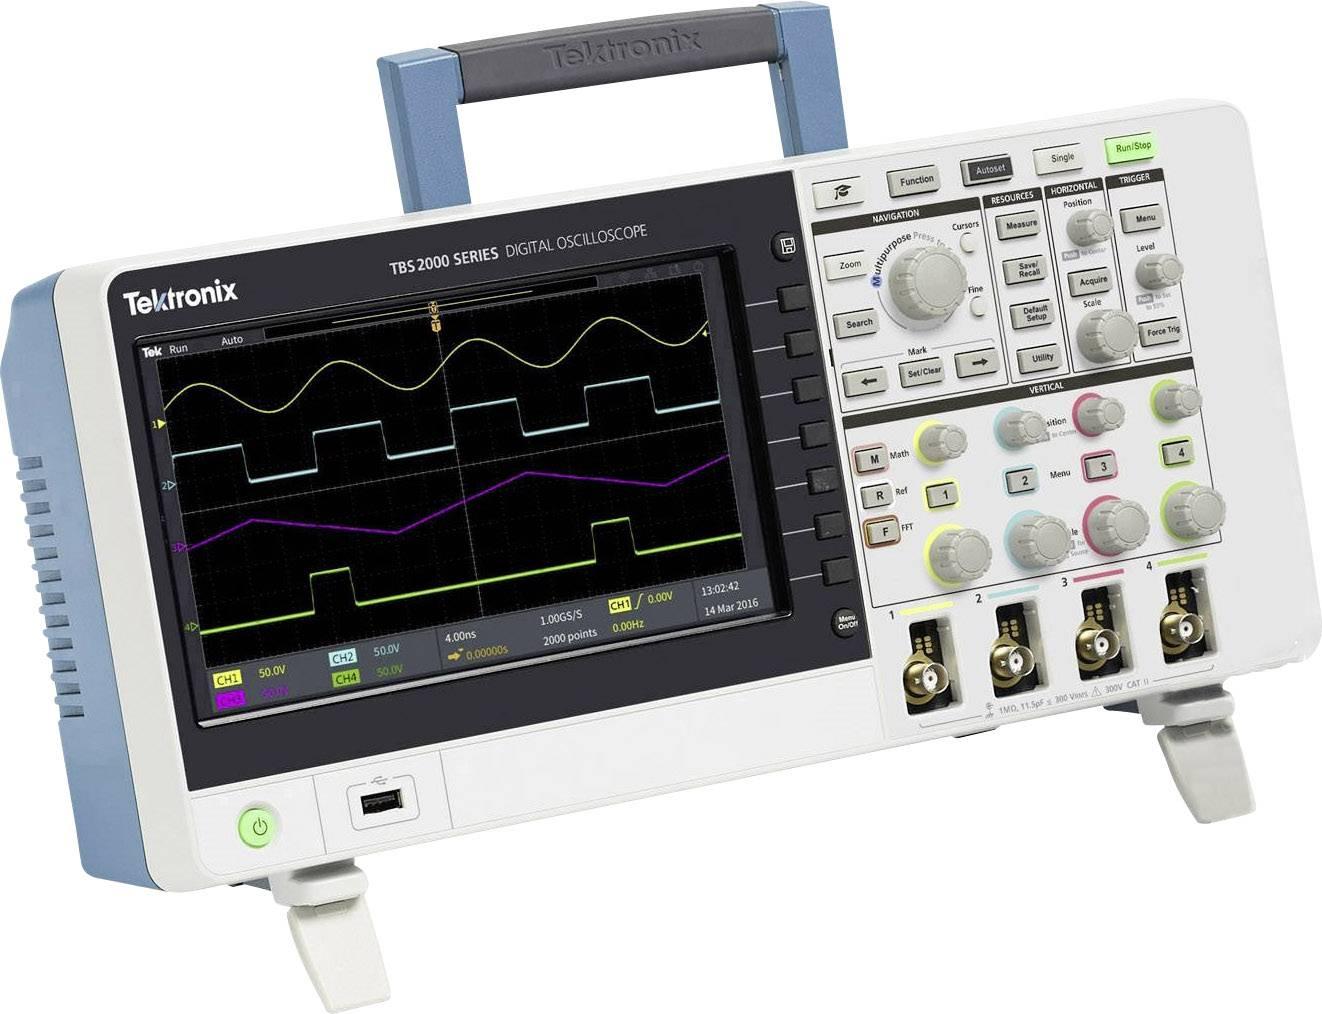 Digitální osciloskop Tektronix TBS2104, 100 MHz, Kalibrováno dle ISO